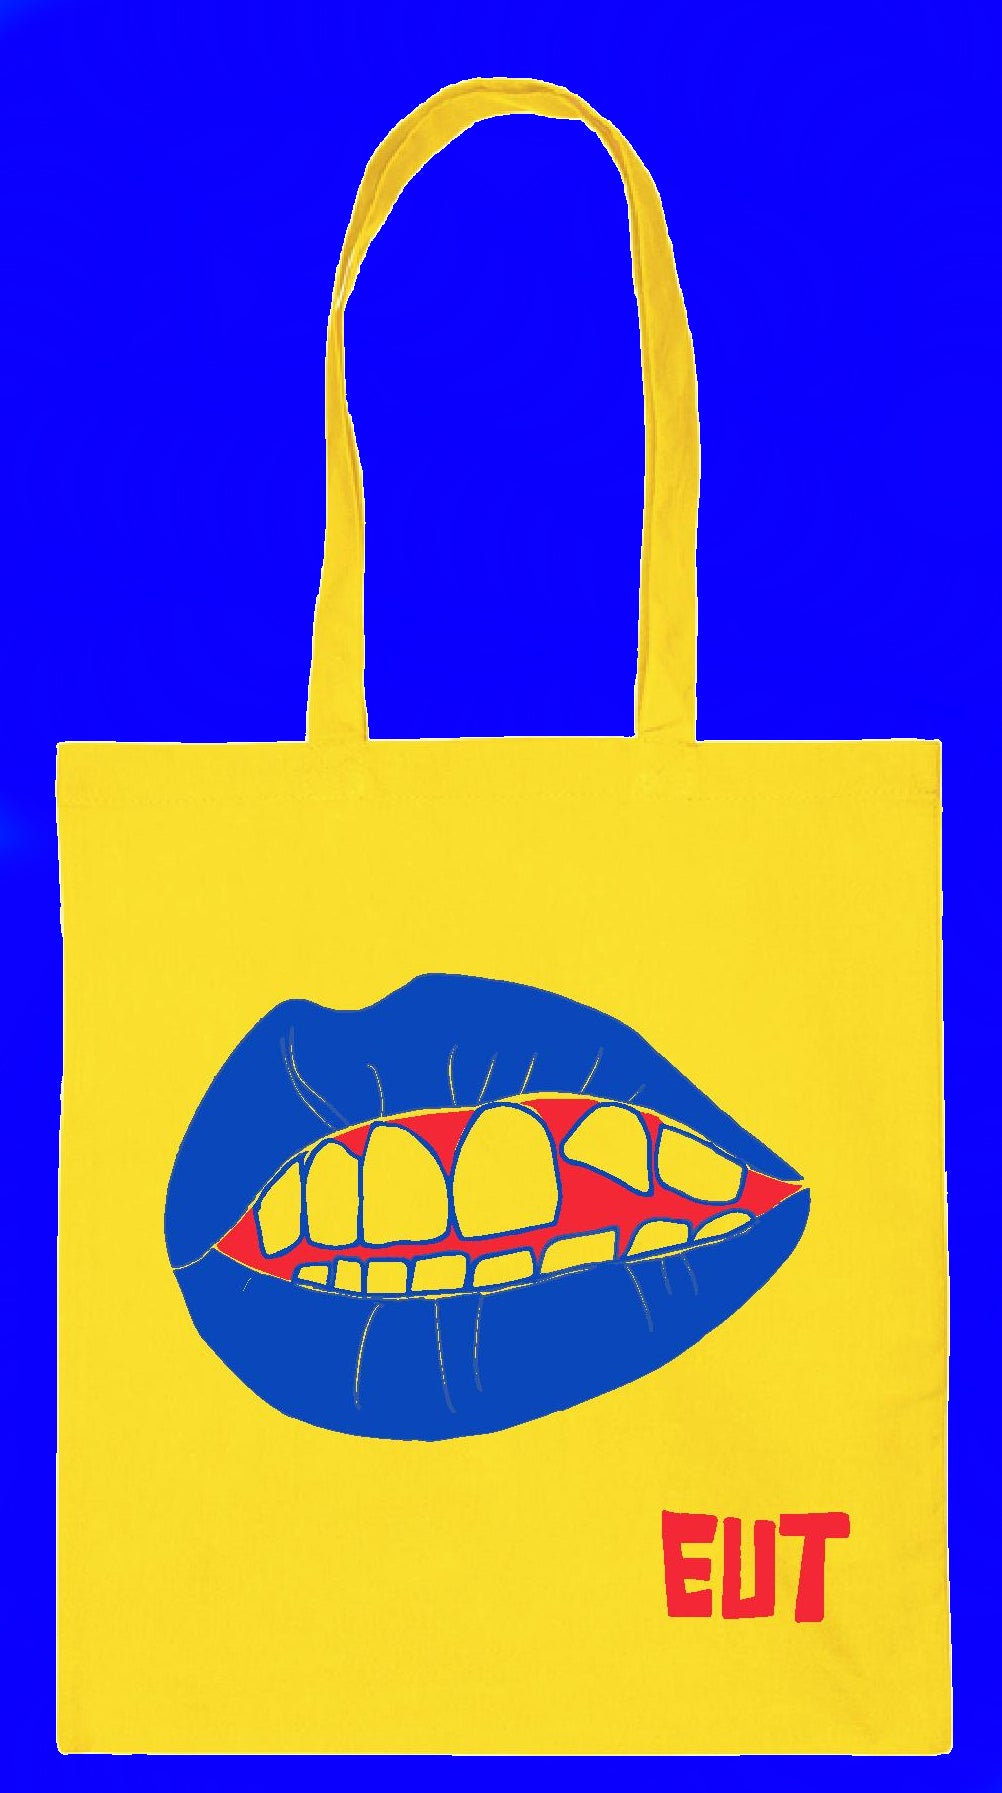 EUT mouth tote bag